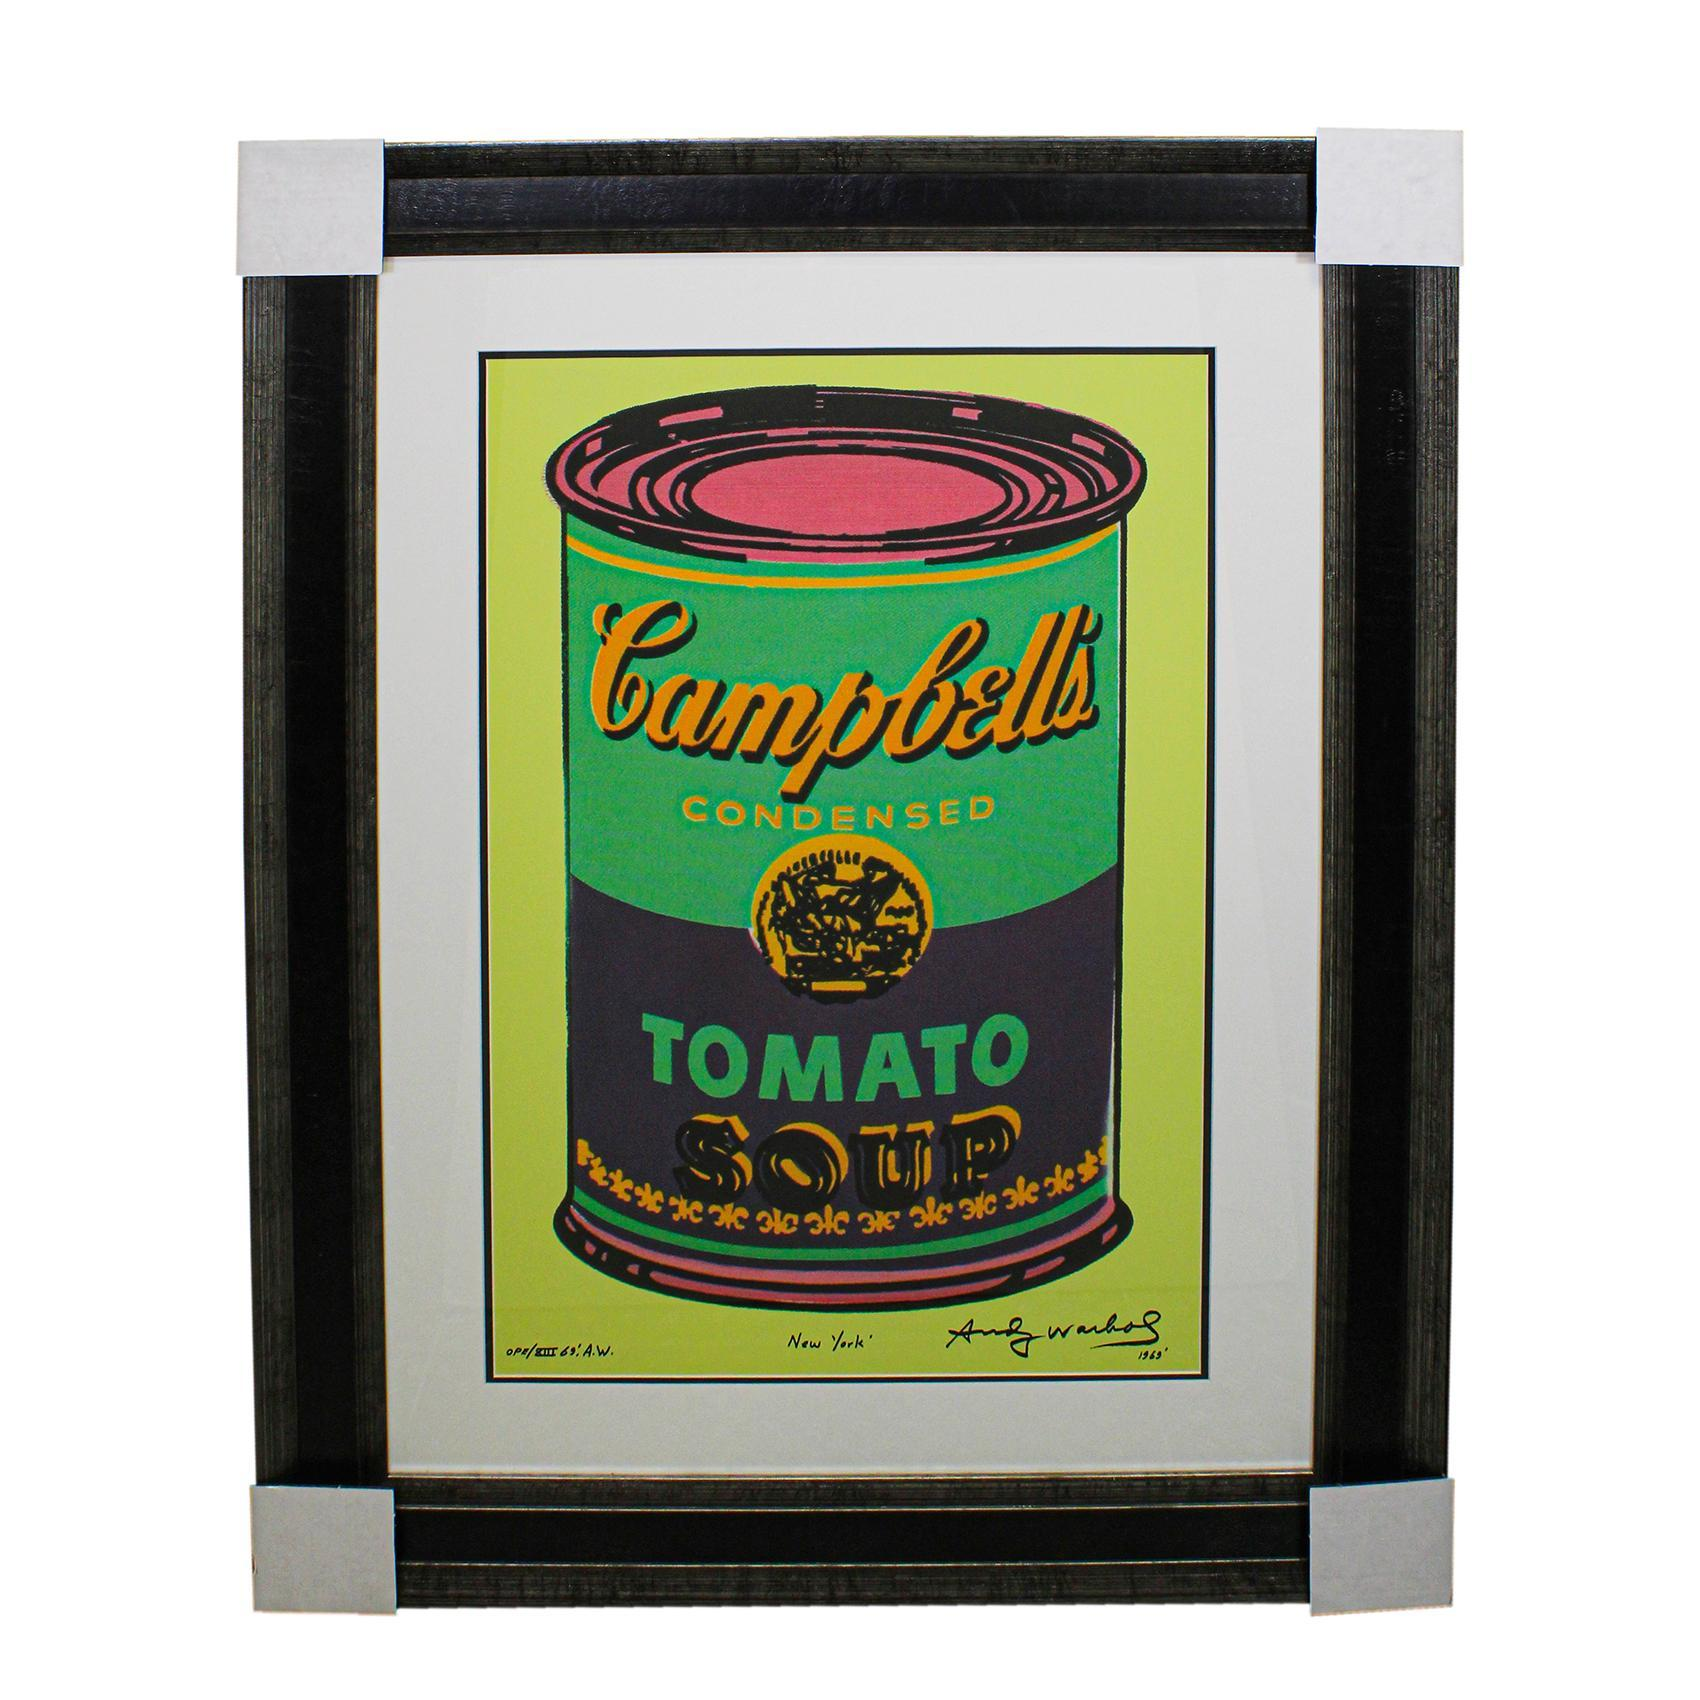 Andy Warhol Campbells Tomato Soup Pop Art Print